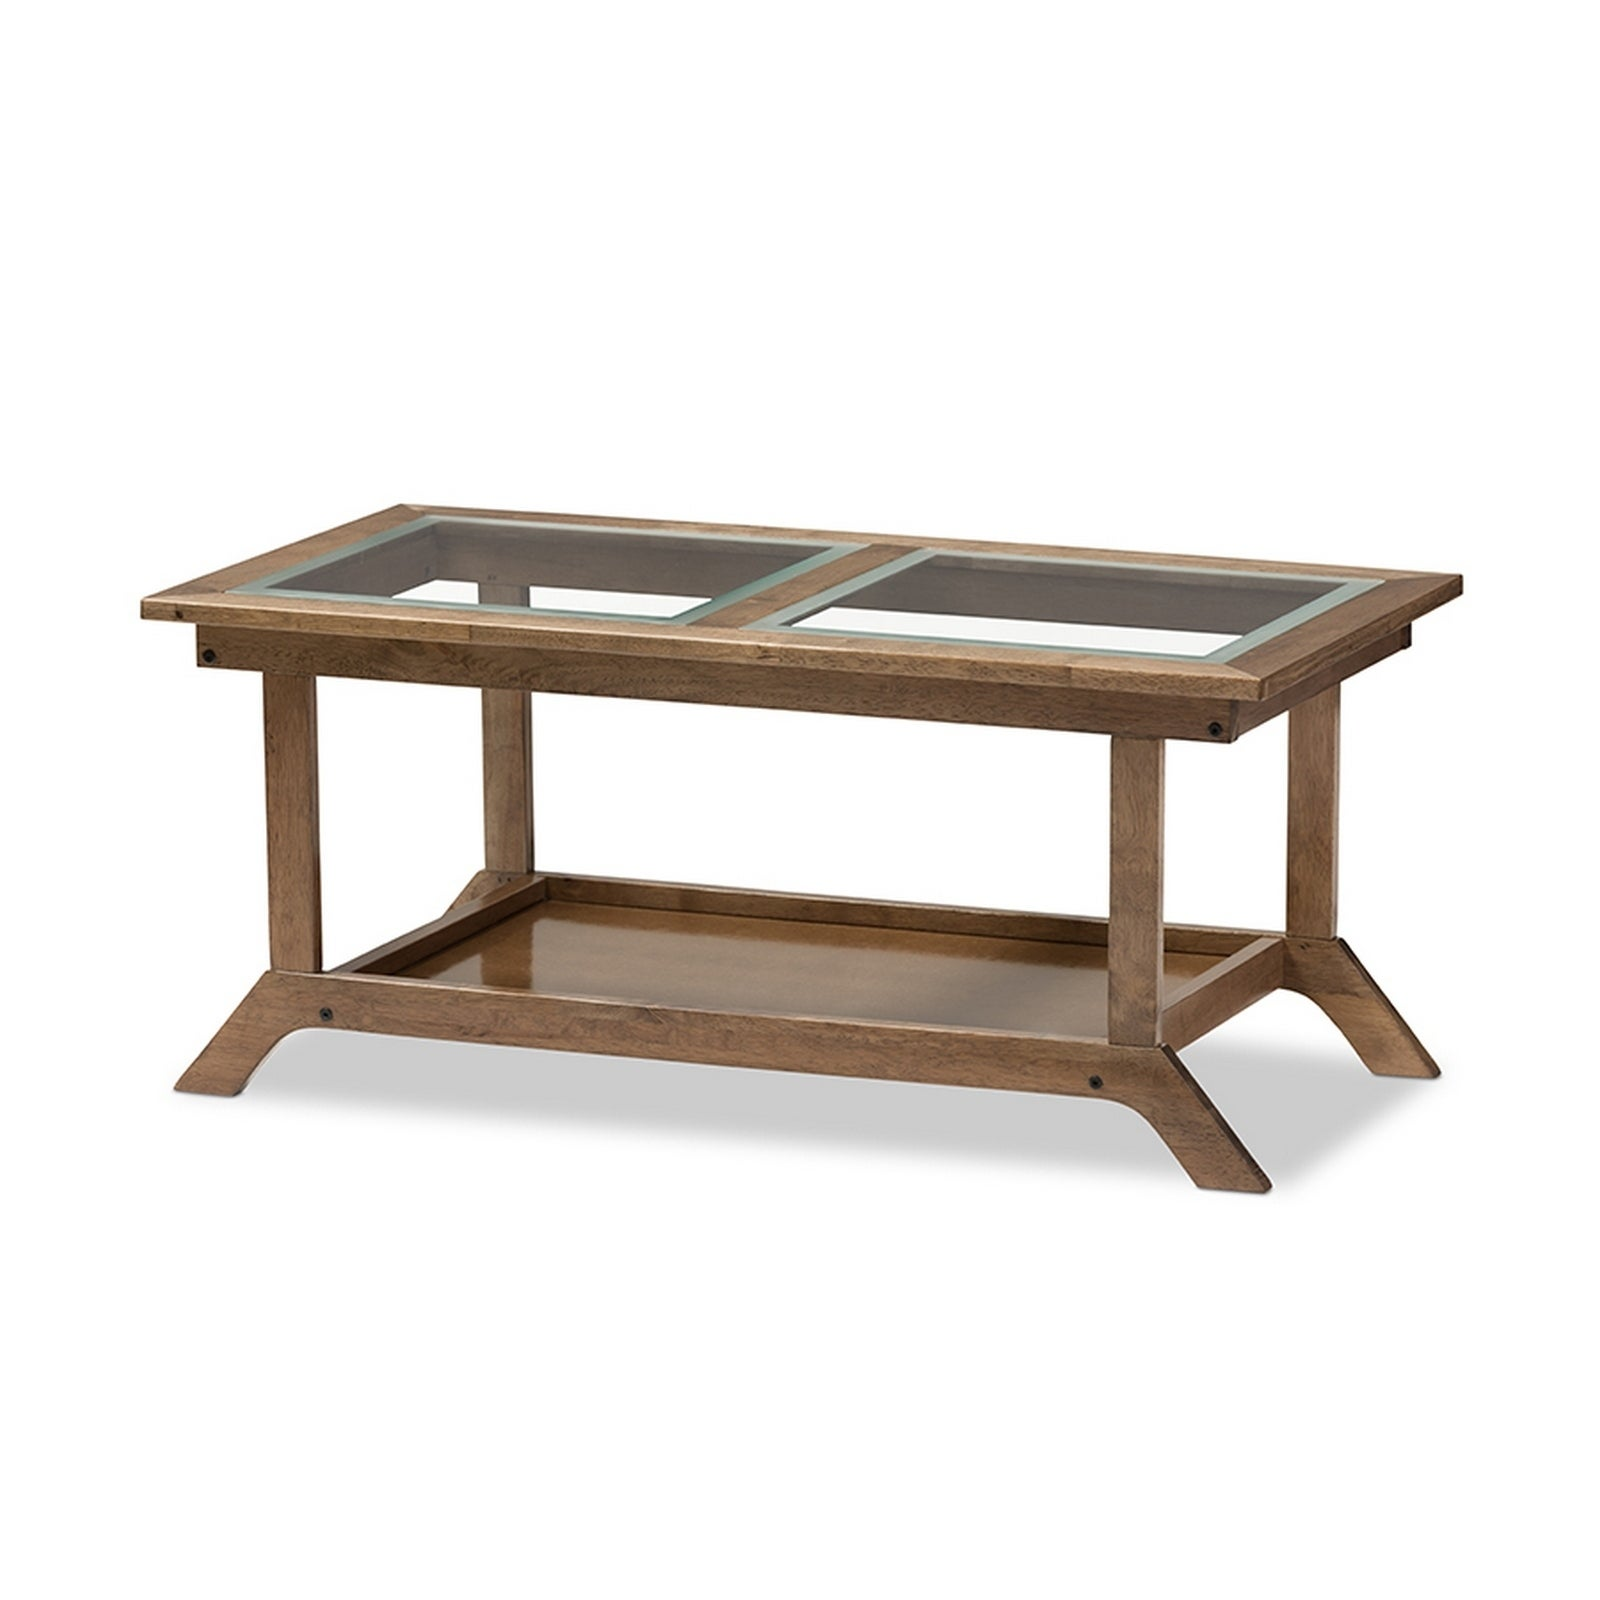 Urban designs cayla modern walnut brown wood glass top coffee table